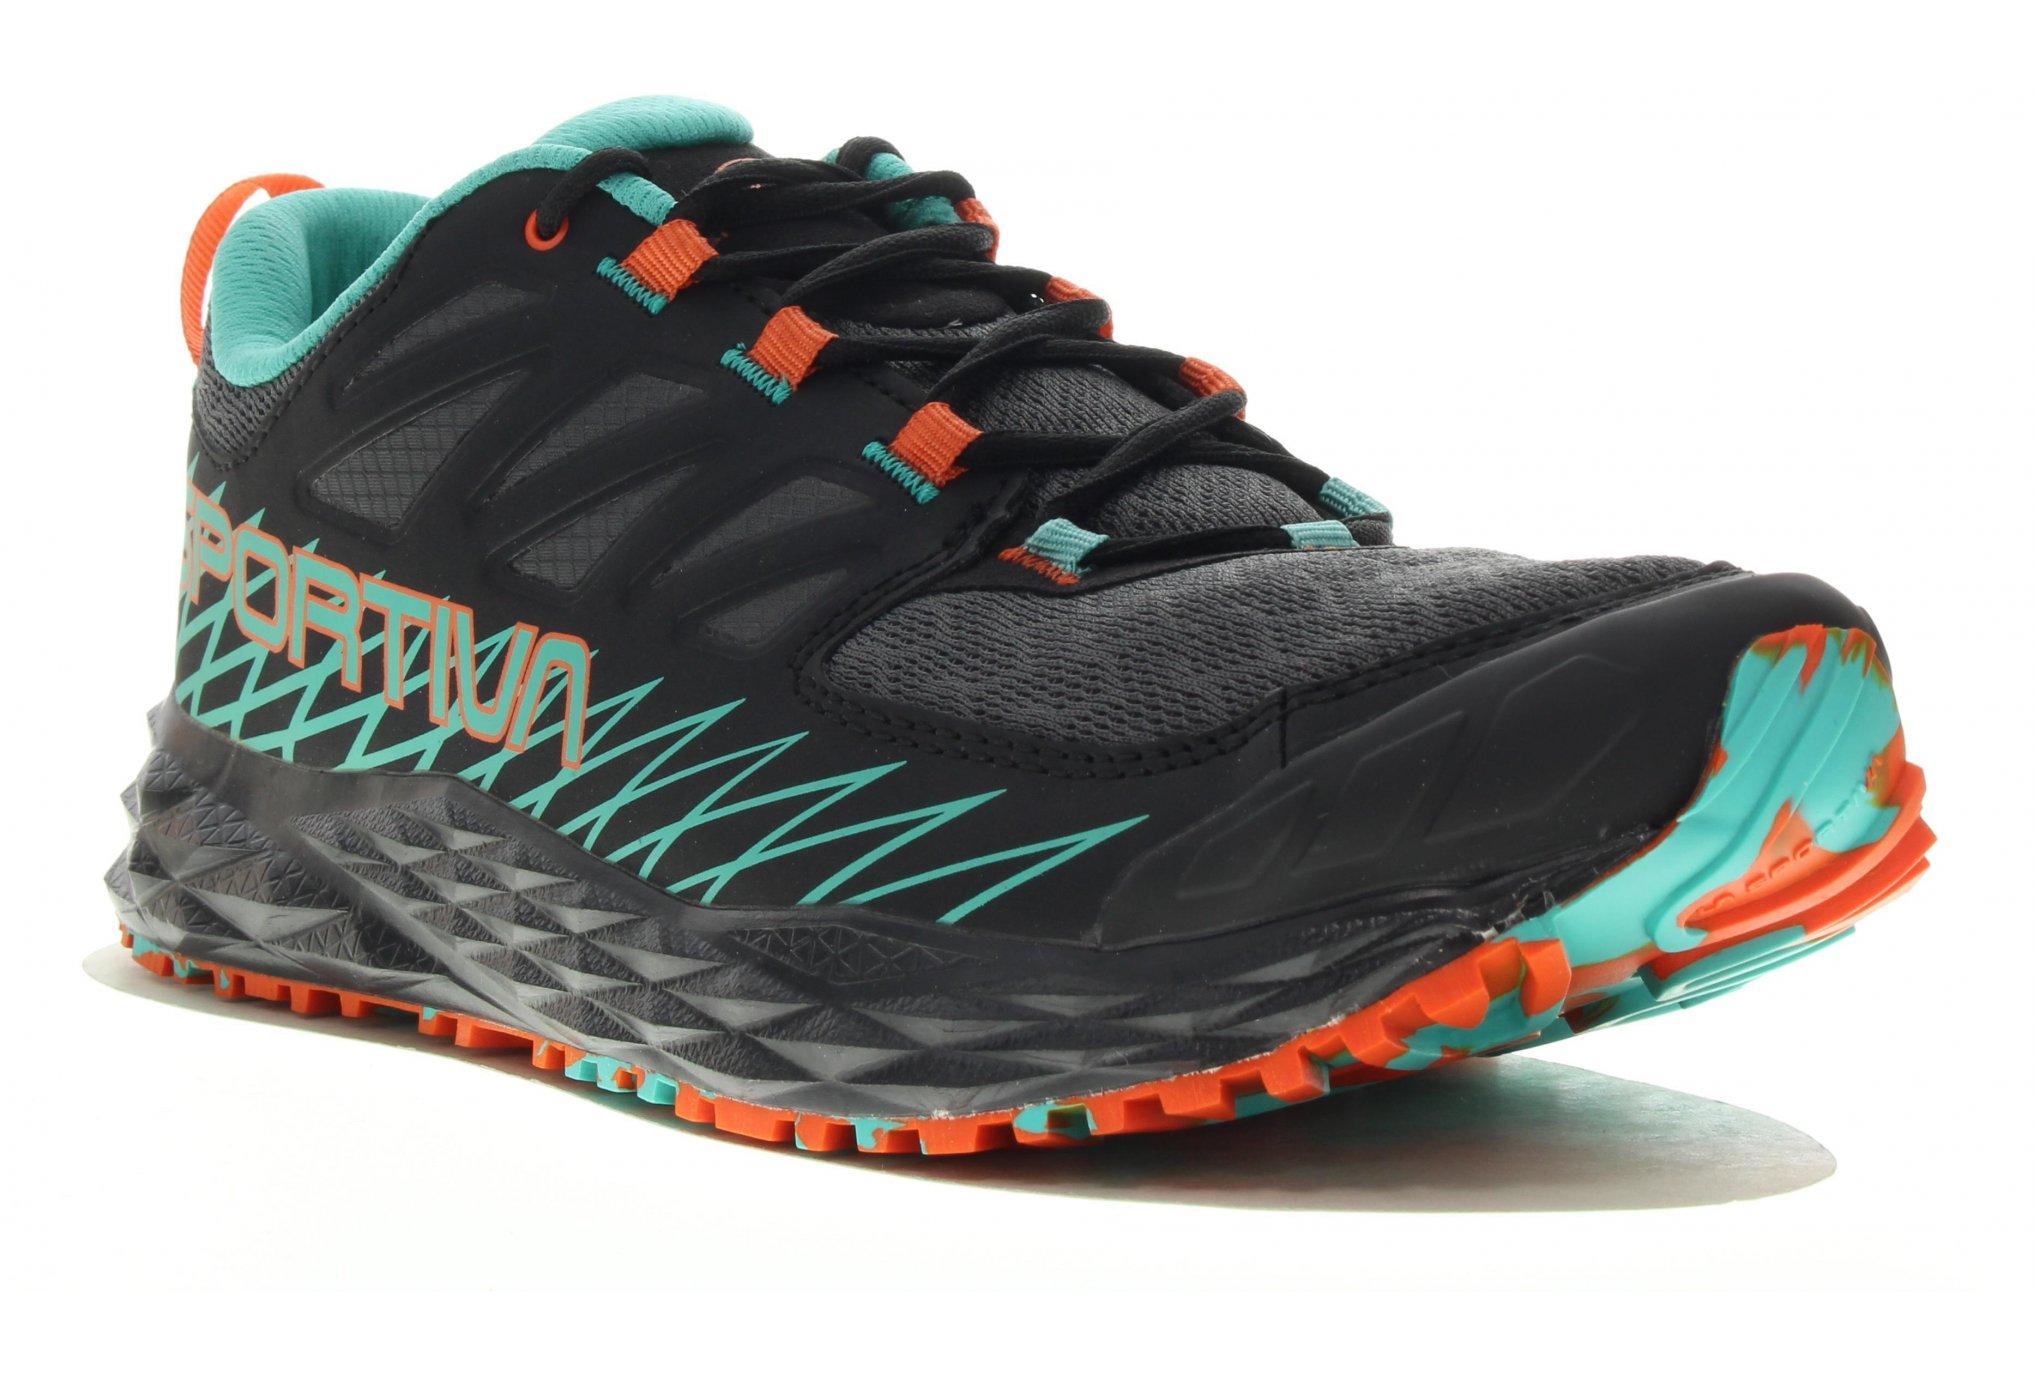 07e97cefa Outlet de zapatillas de running La Sportiva talla 37 baratas ...